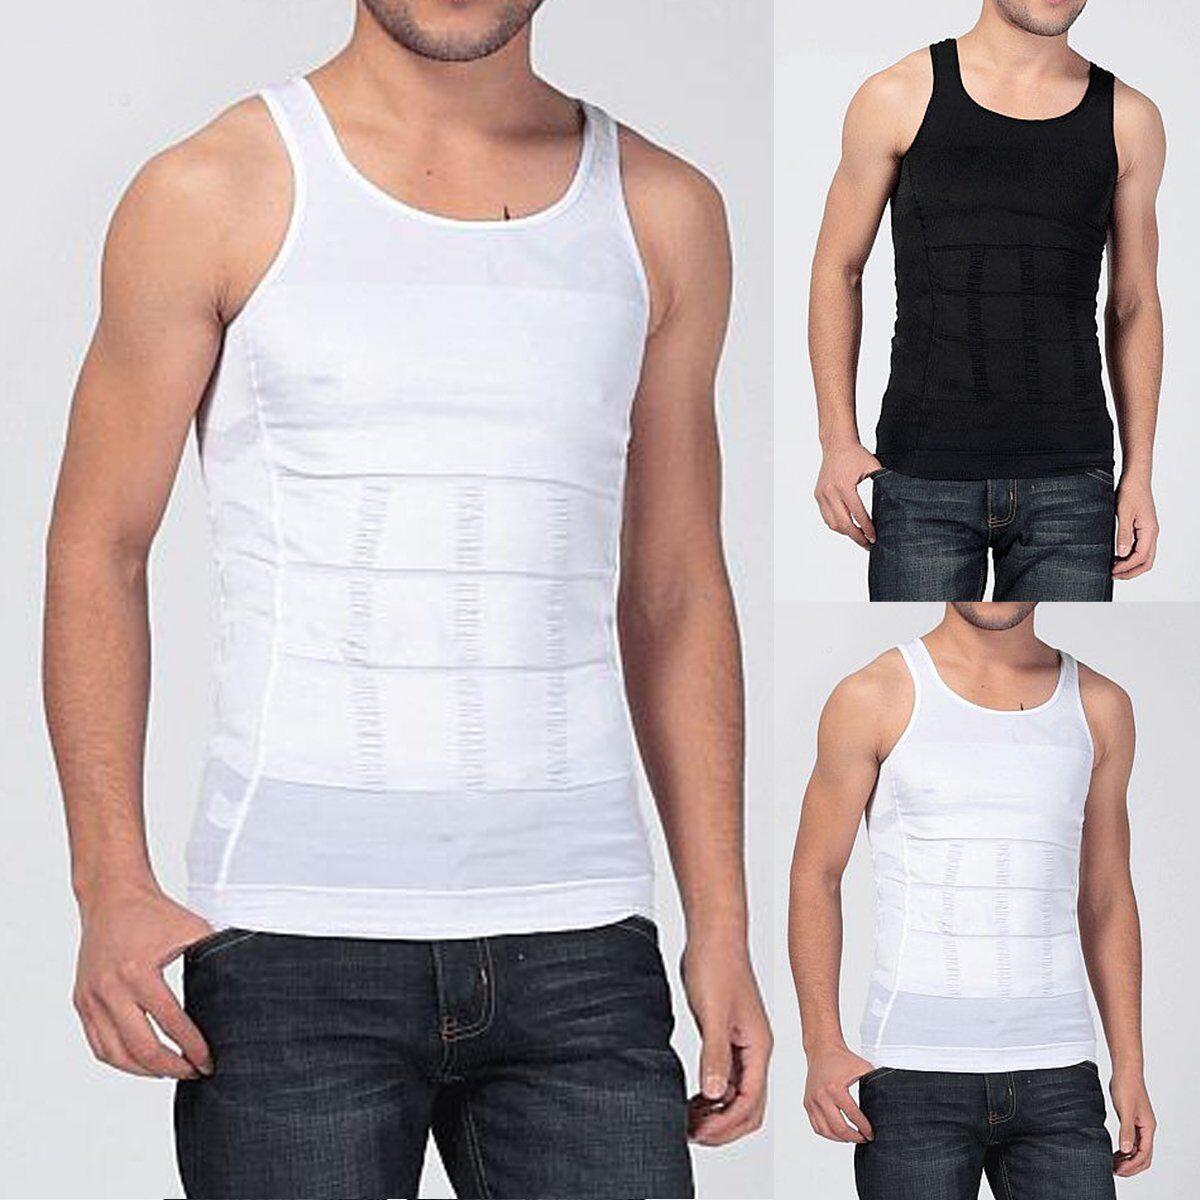 Men's Slim Body Shaper Tummy Belly Fatty Underwear Vest T Sh